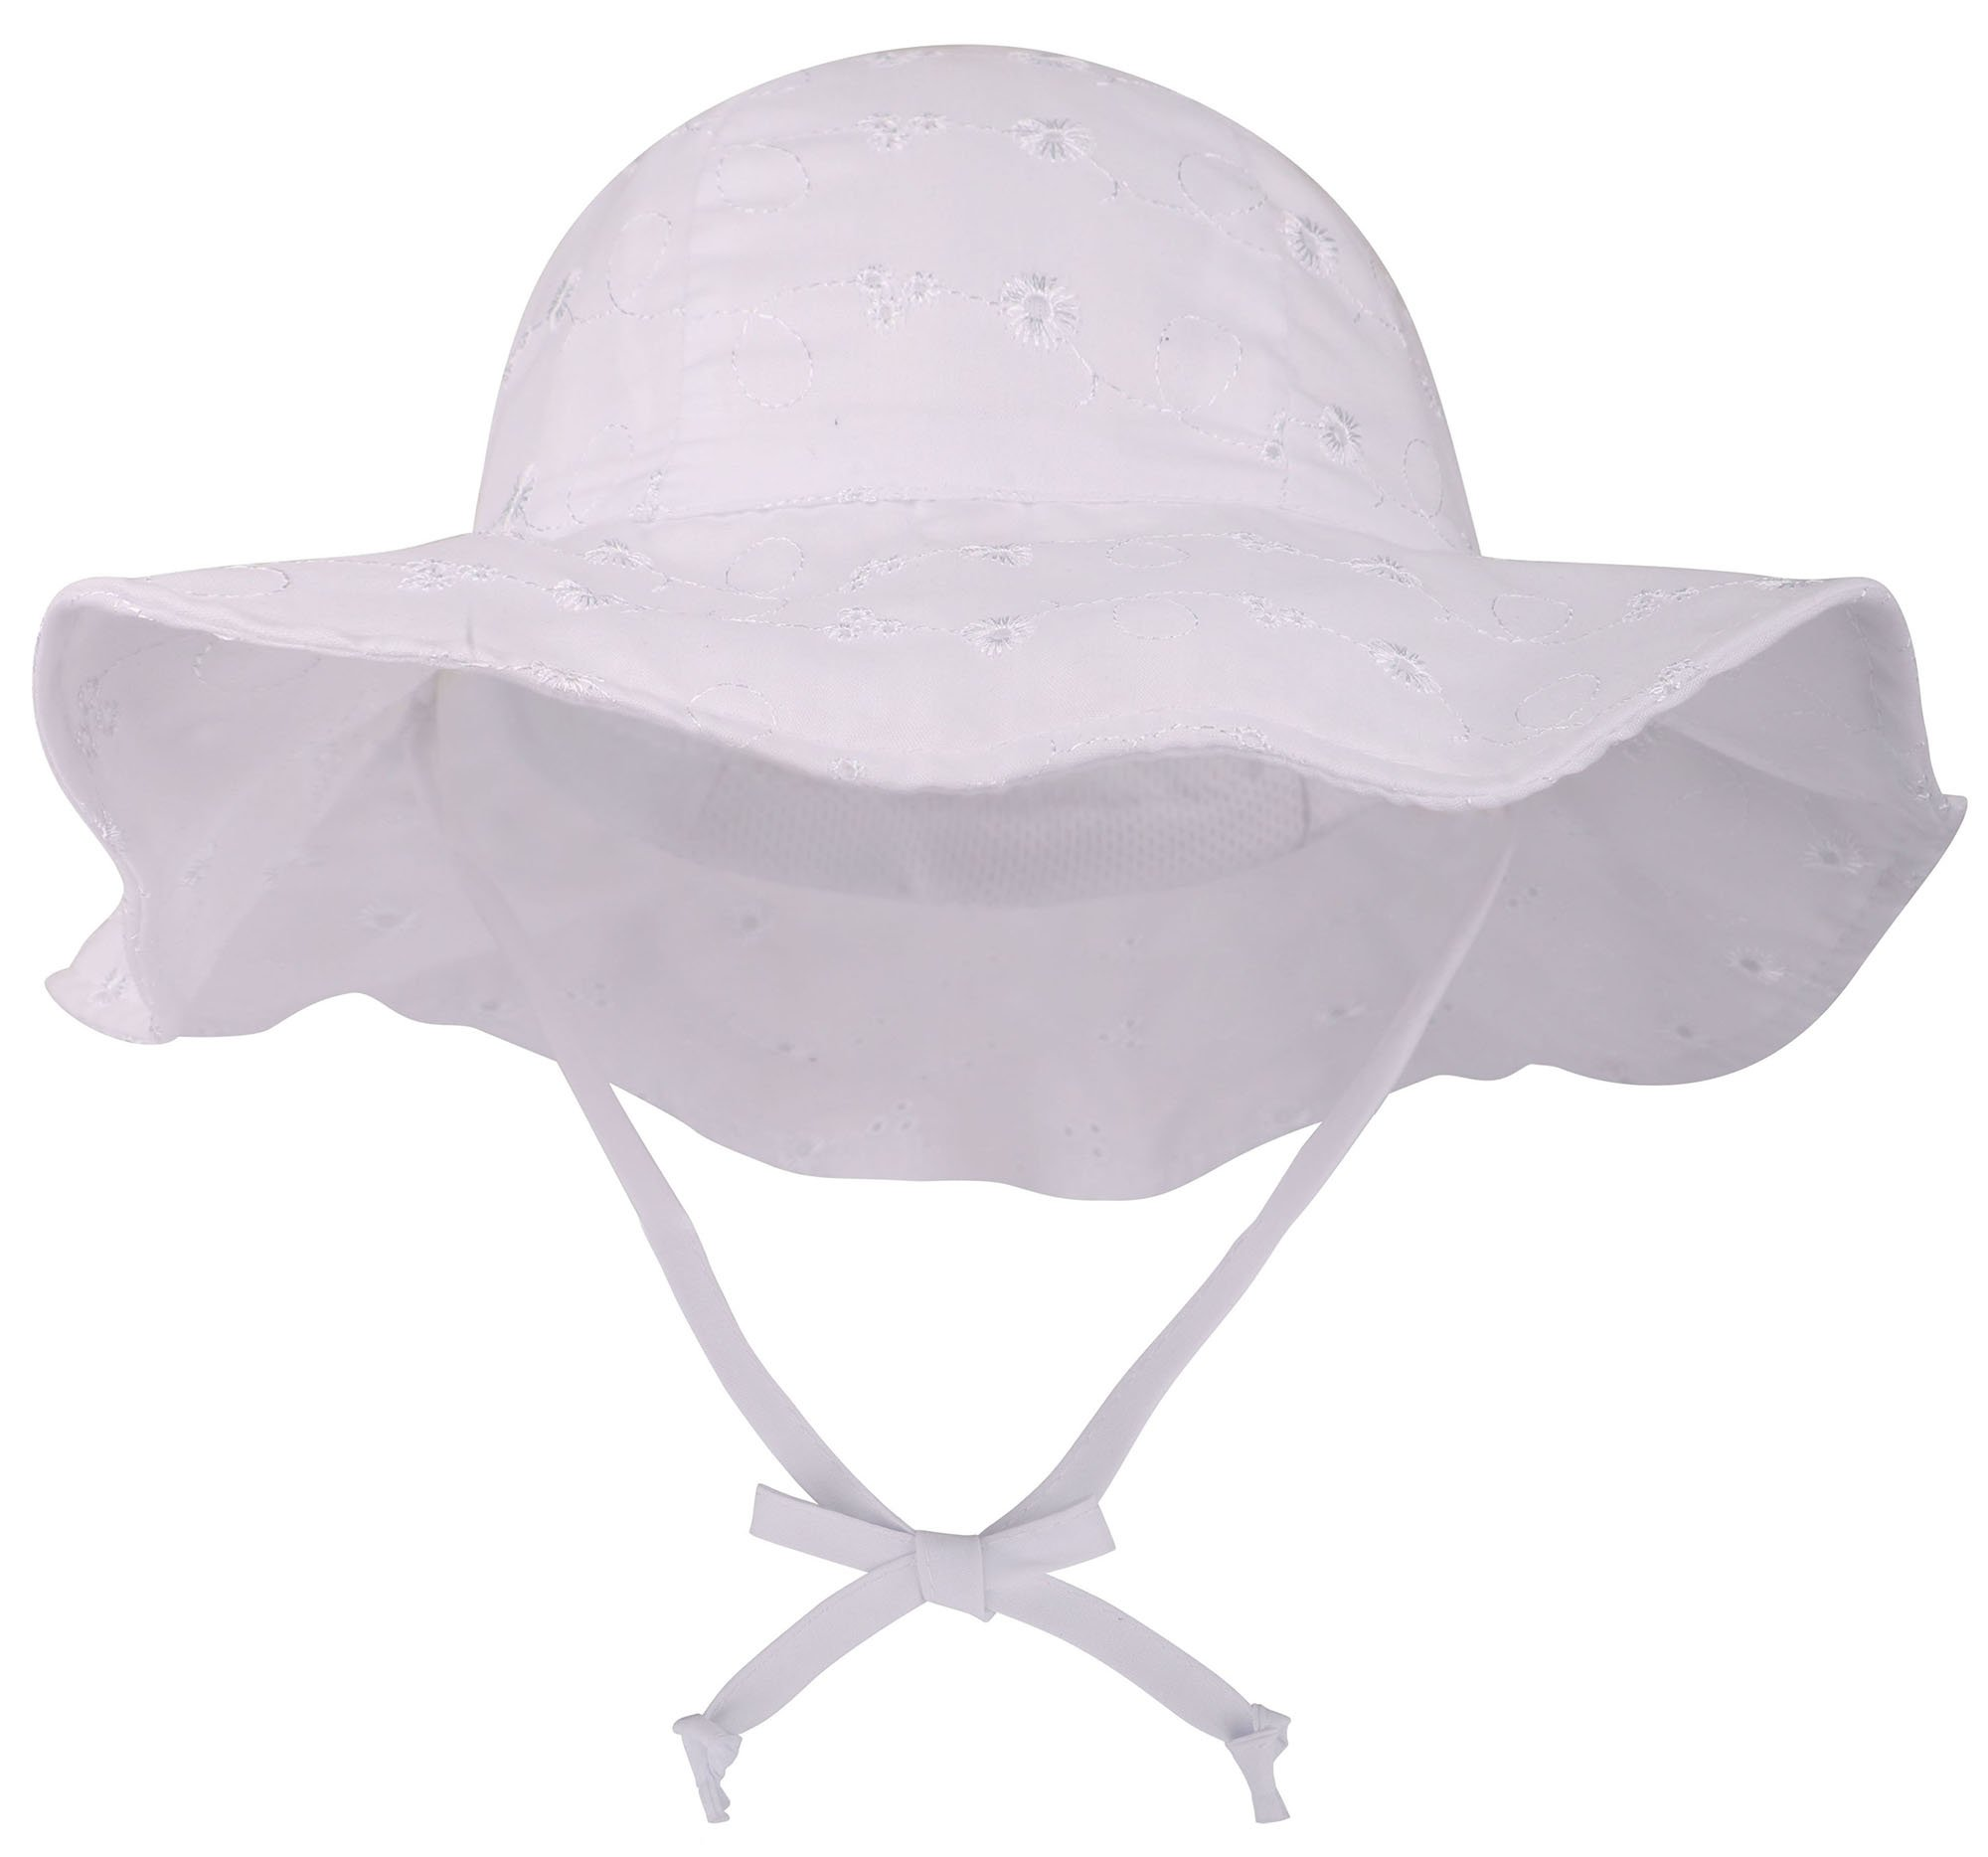 SimpliKids UPF 50+ UV Sun Protection Wide Brim Baby Sun Hat,White #2,0-12 Months by SimpliKids